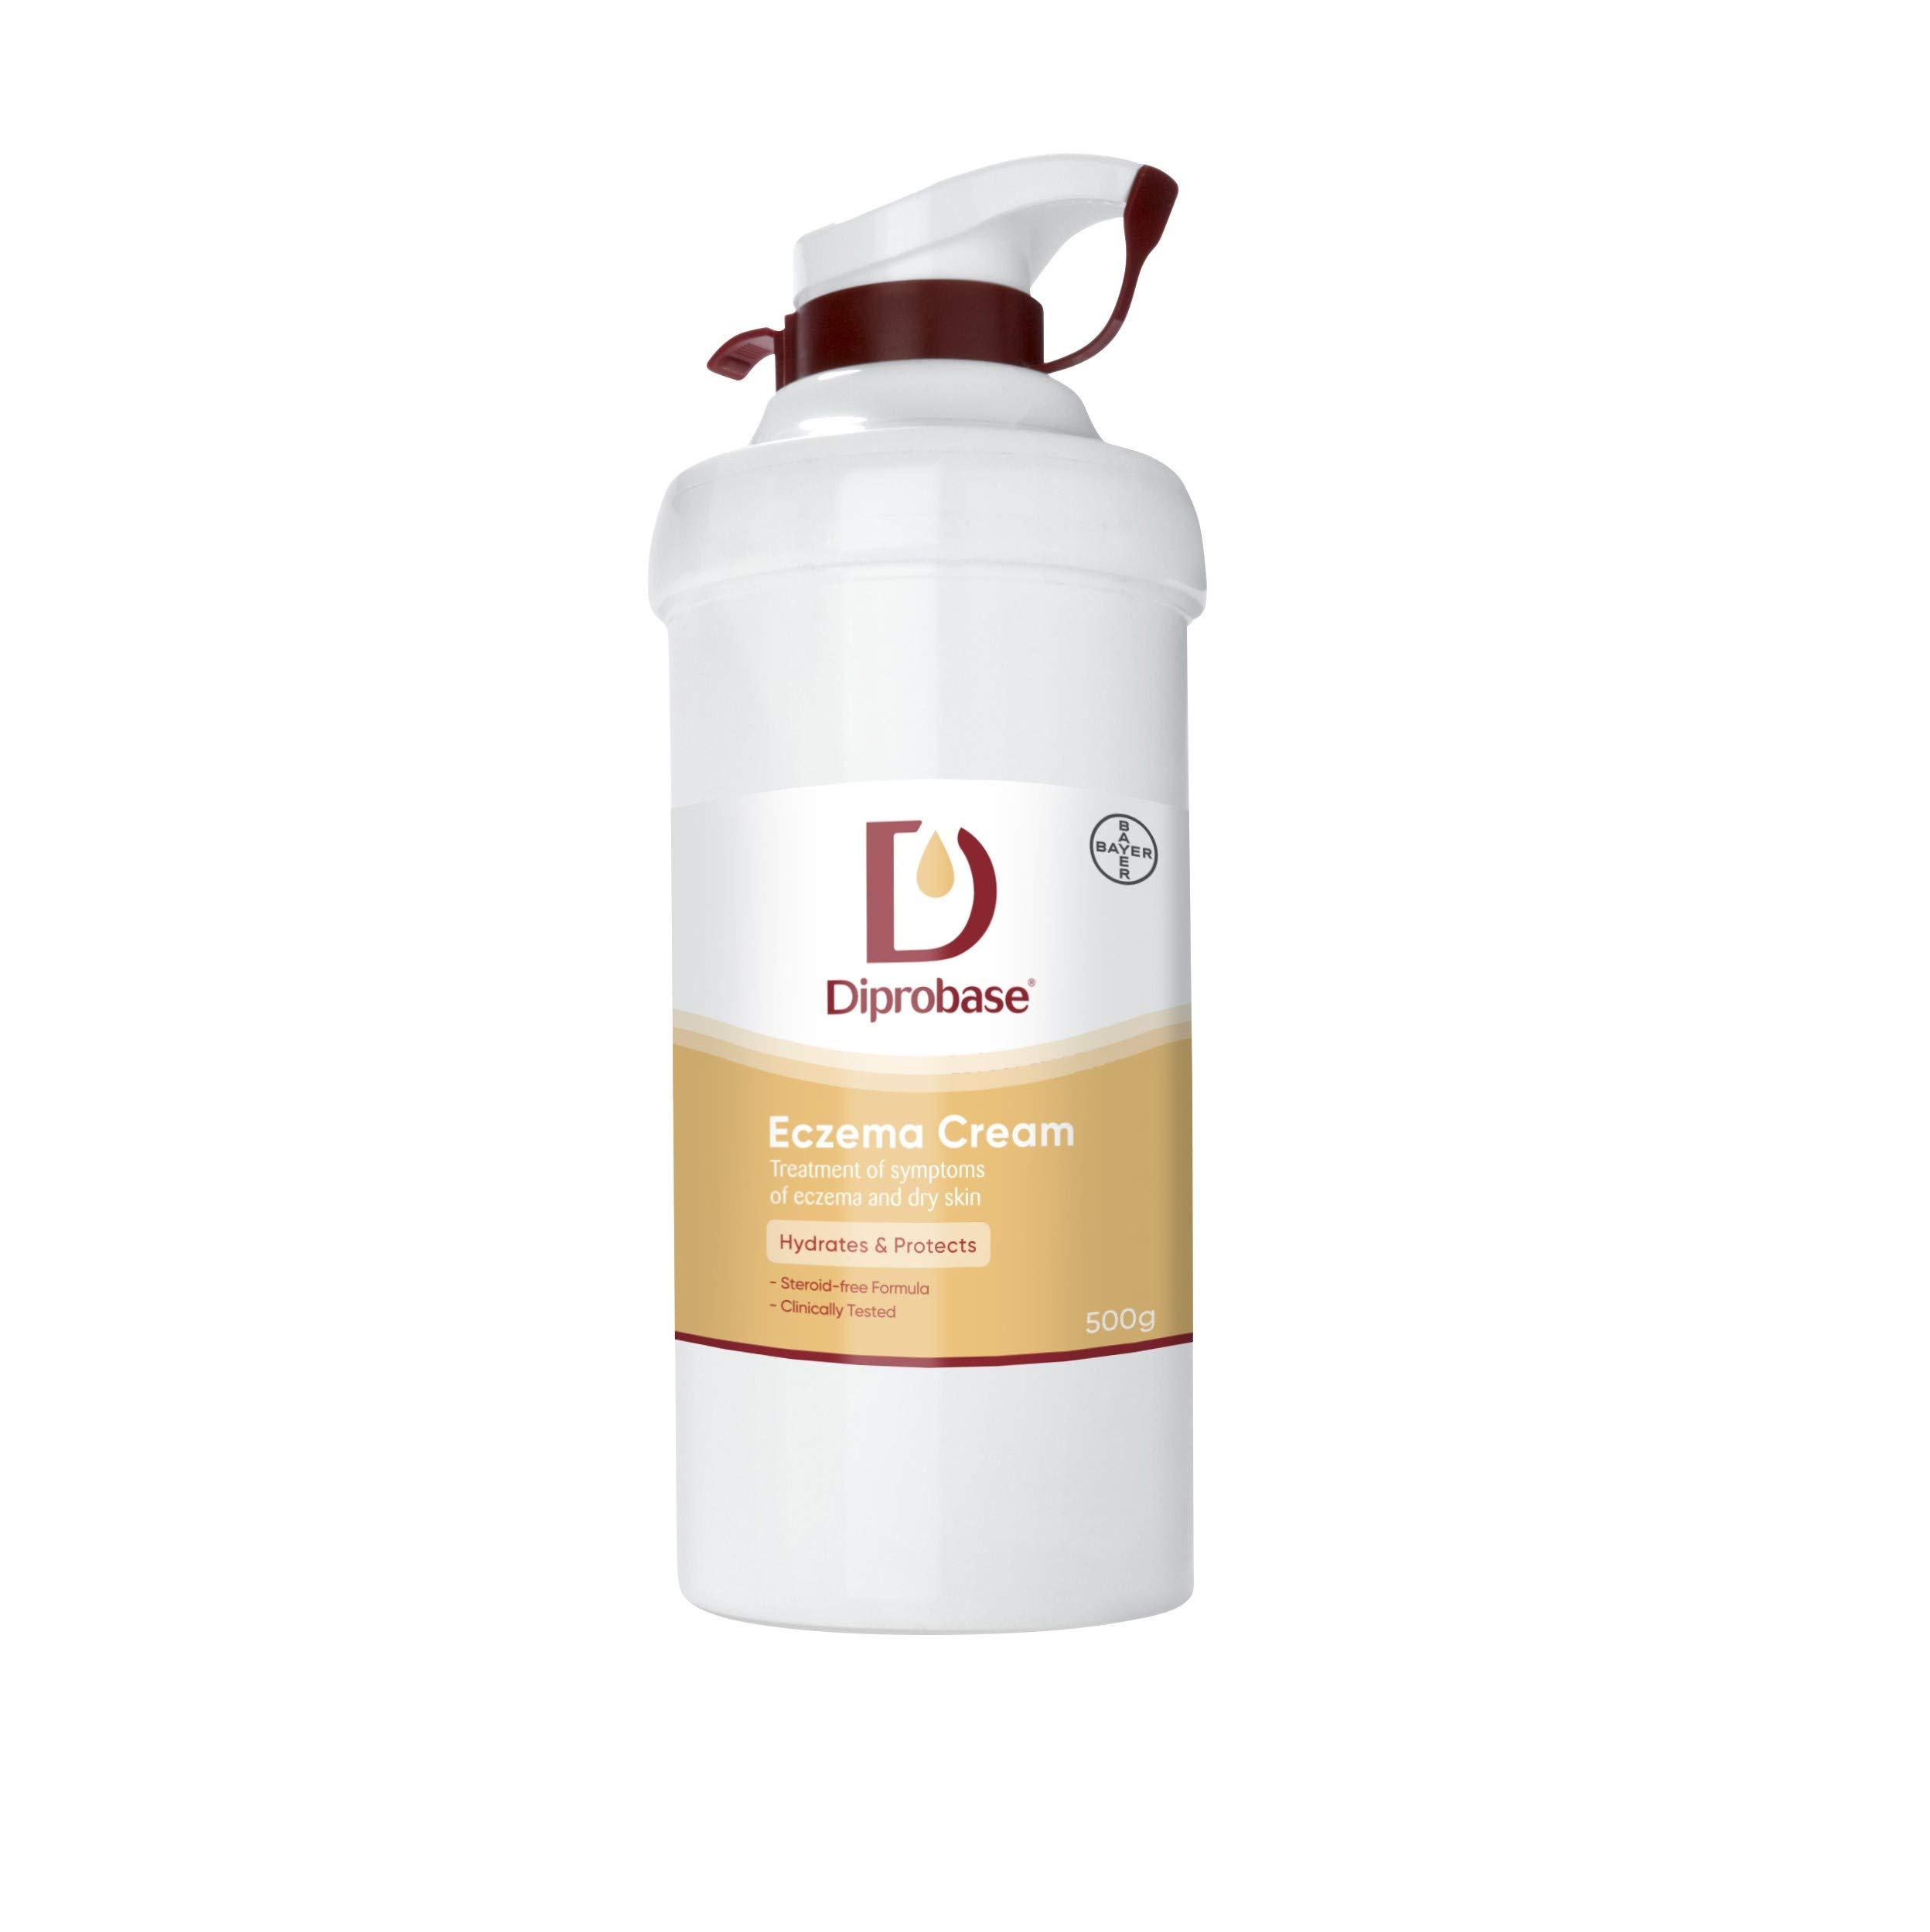 Diprobase Emollient Cream With Pump Dispenser 500Gm Pk Of 2